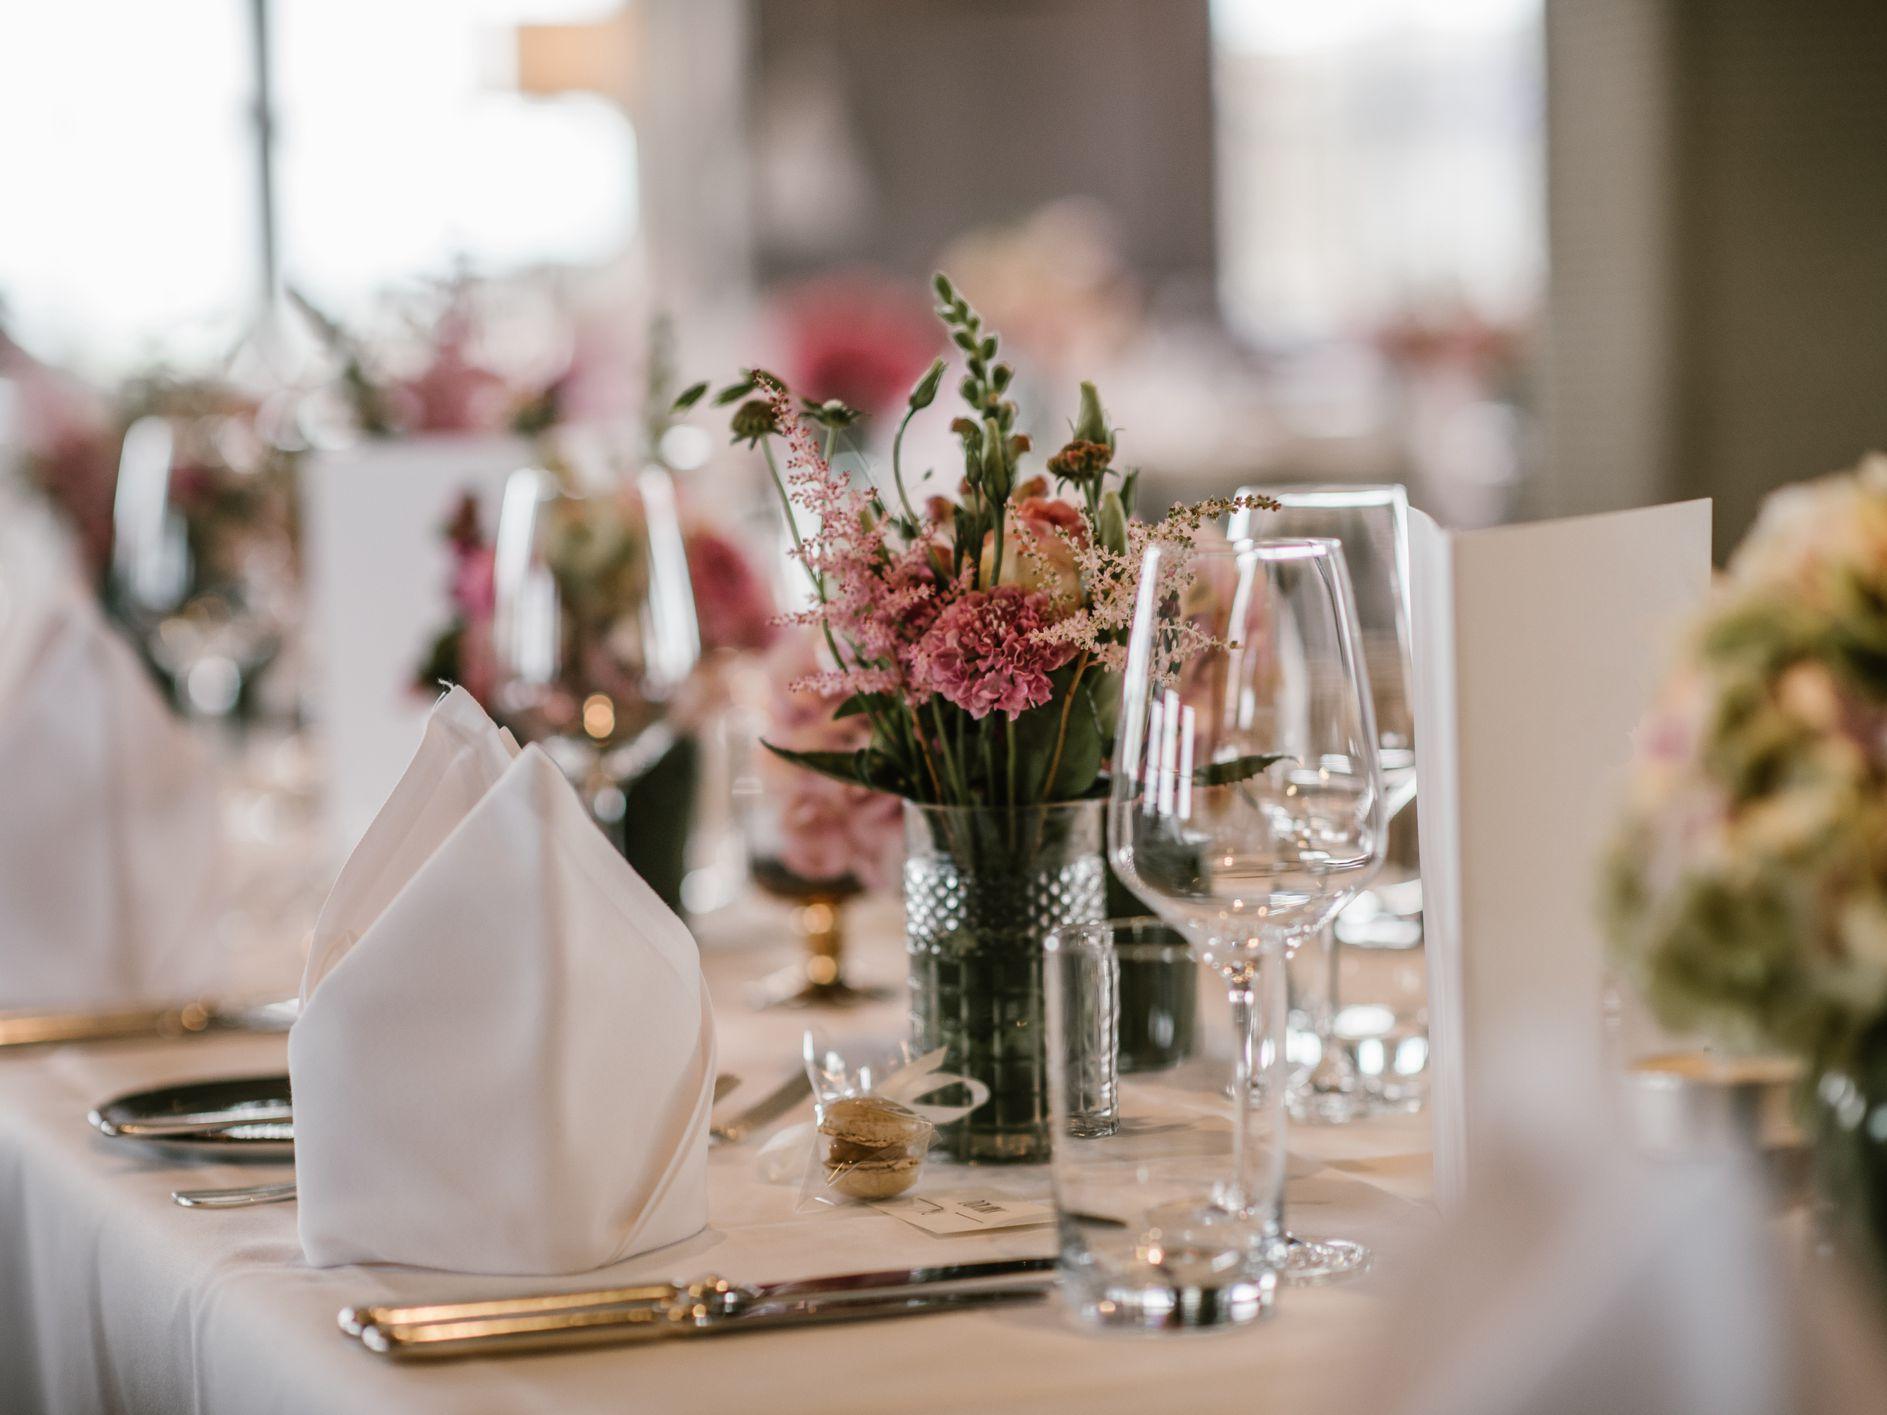 8 Pretty Ways To Fold Napkins At Your Wedding Reception